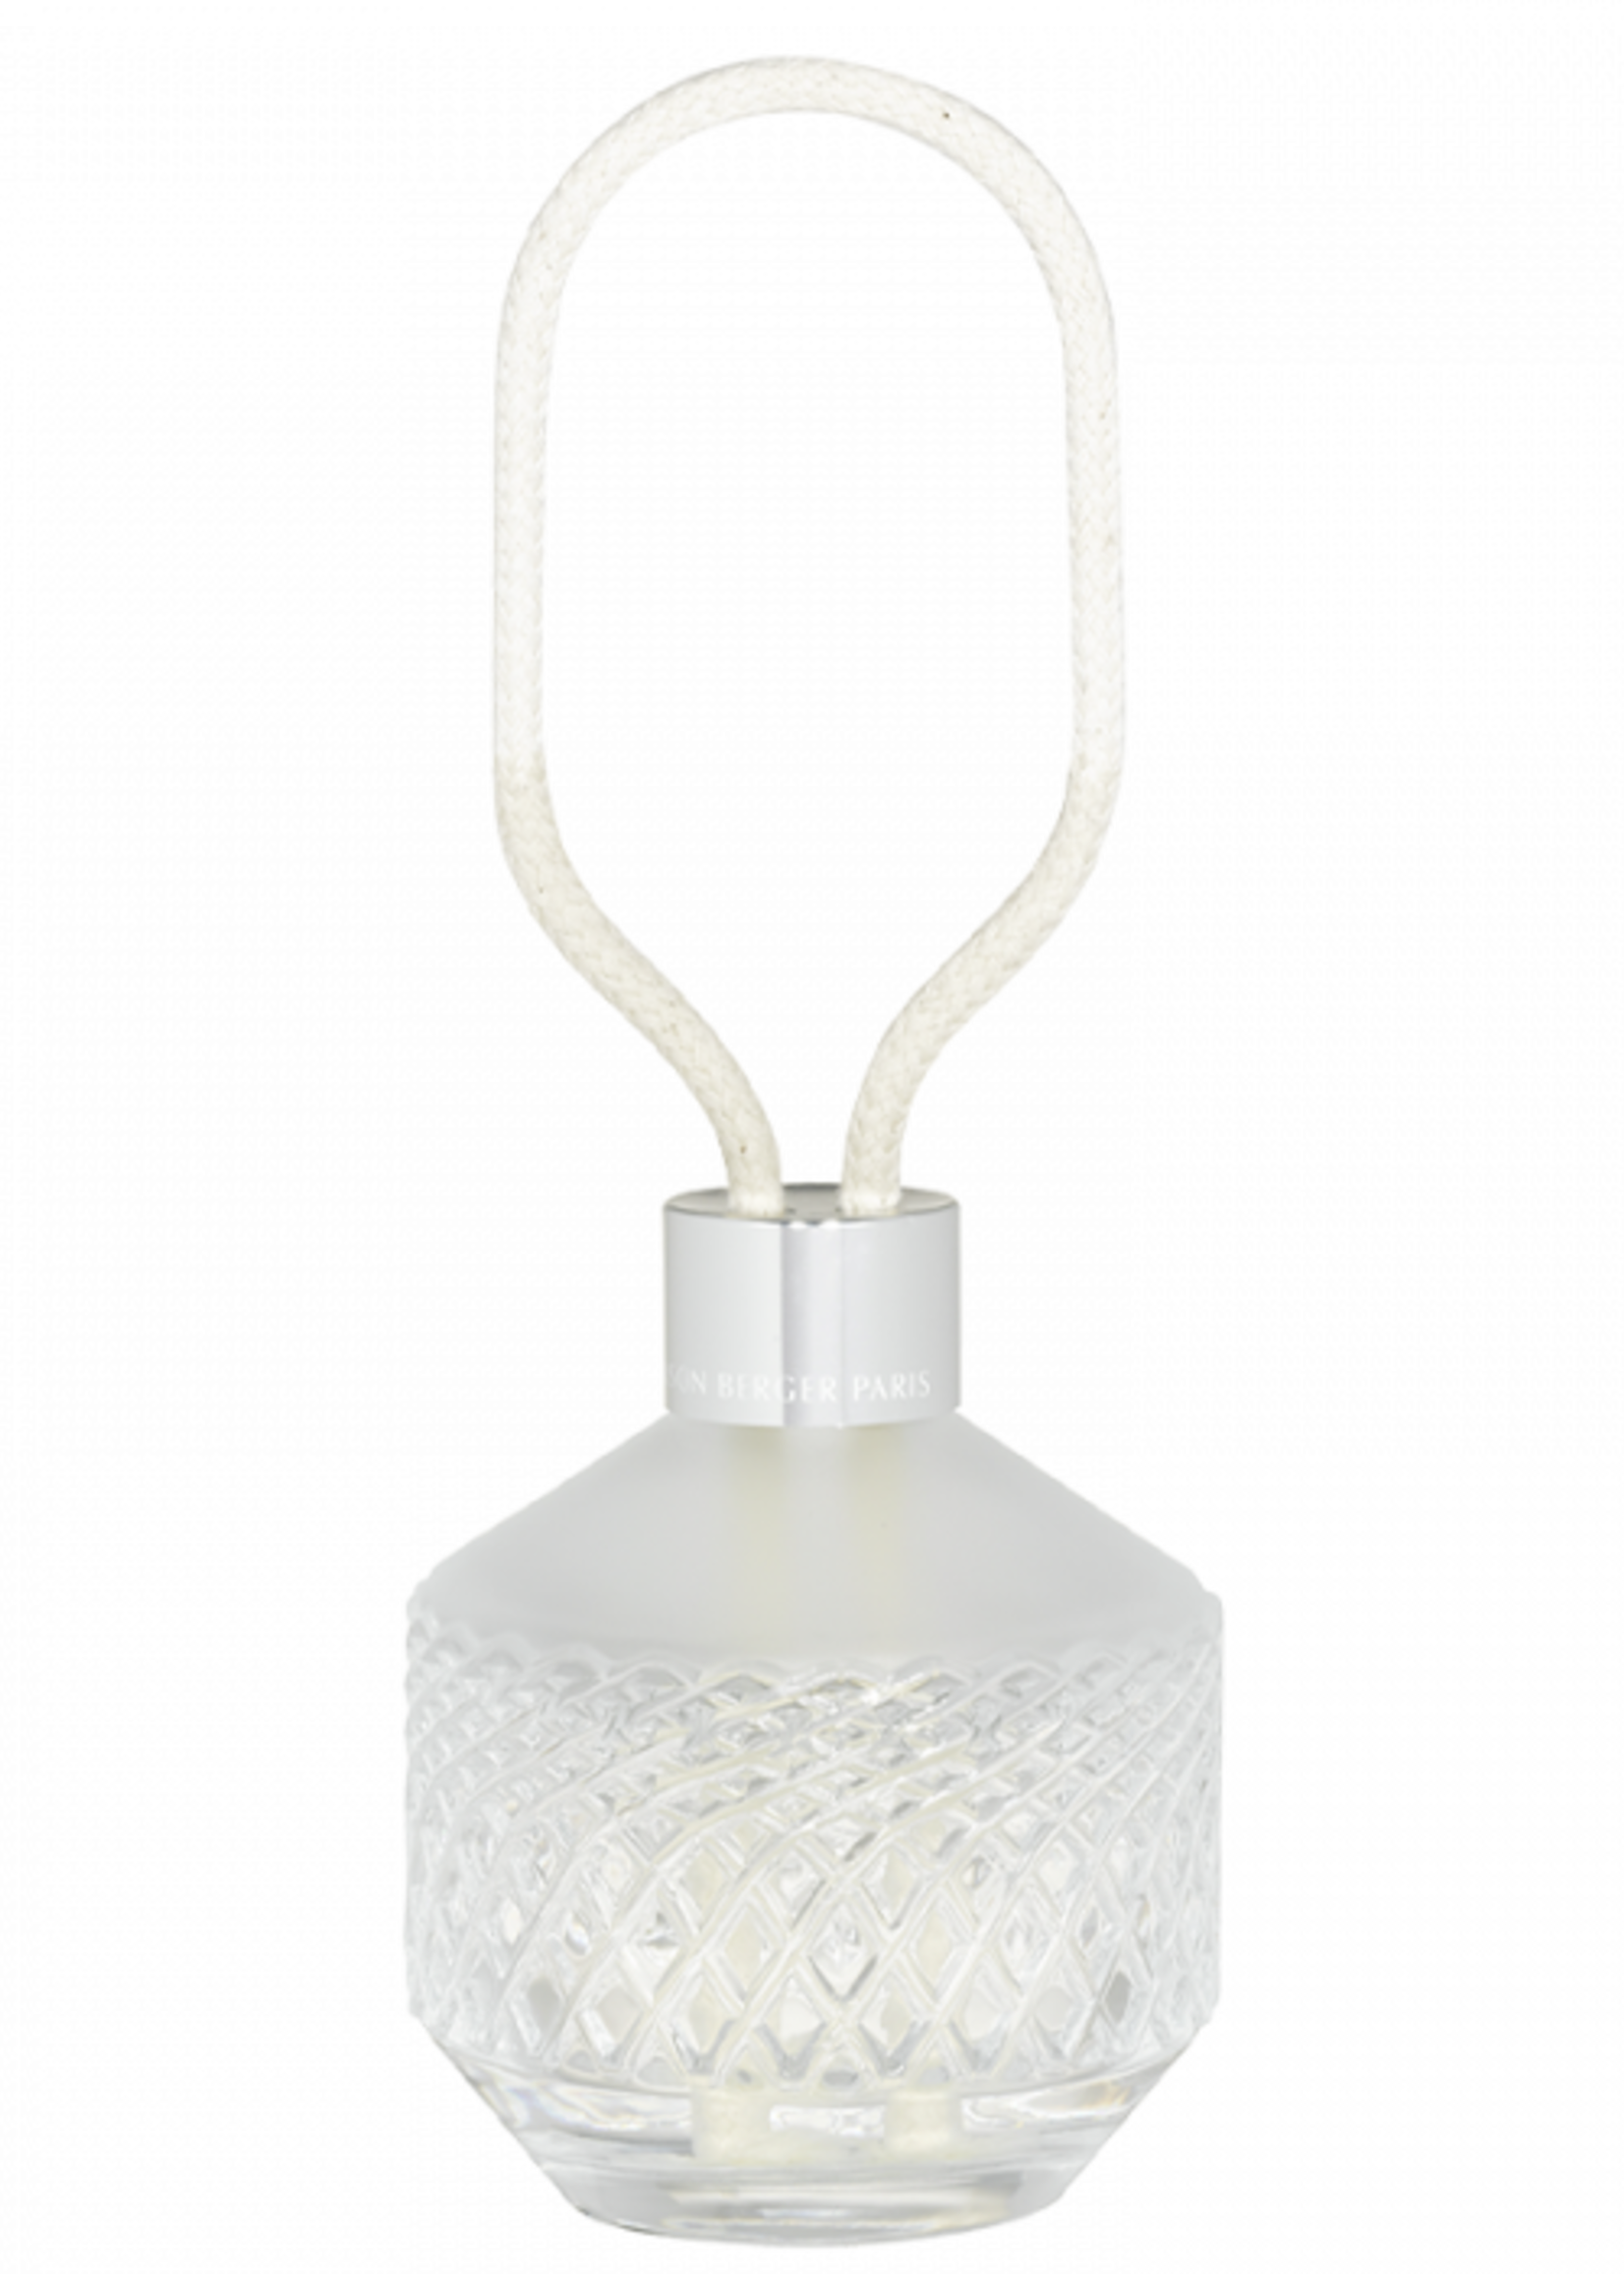 Maison Berger Parfumverspreider Matali Crasset Transparent